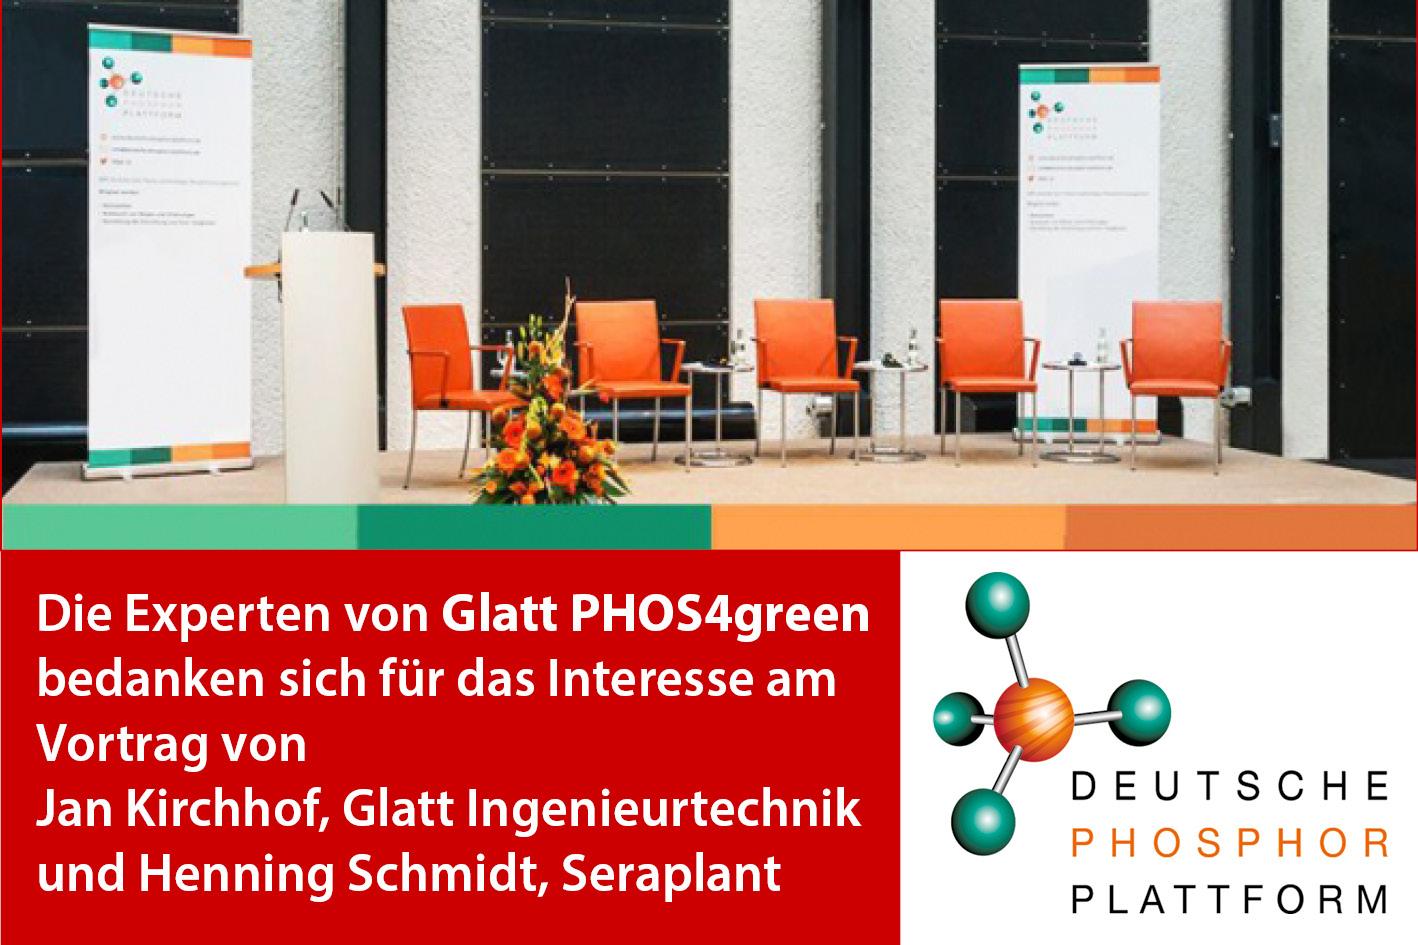 The experts from Glatt PHOS4green would like to thank for the interest in the presentation of Jan Kirchhof, Glatt Ingenieurtechnik, and Henning Schmidt, Seraplant